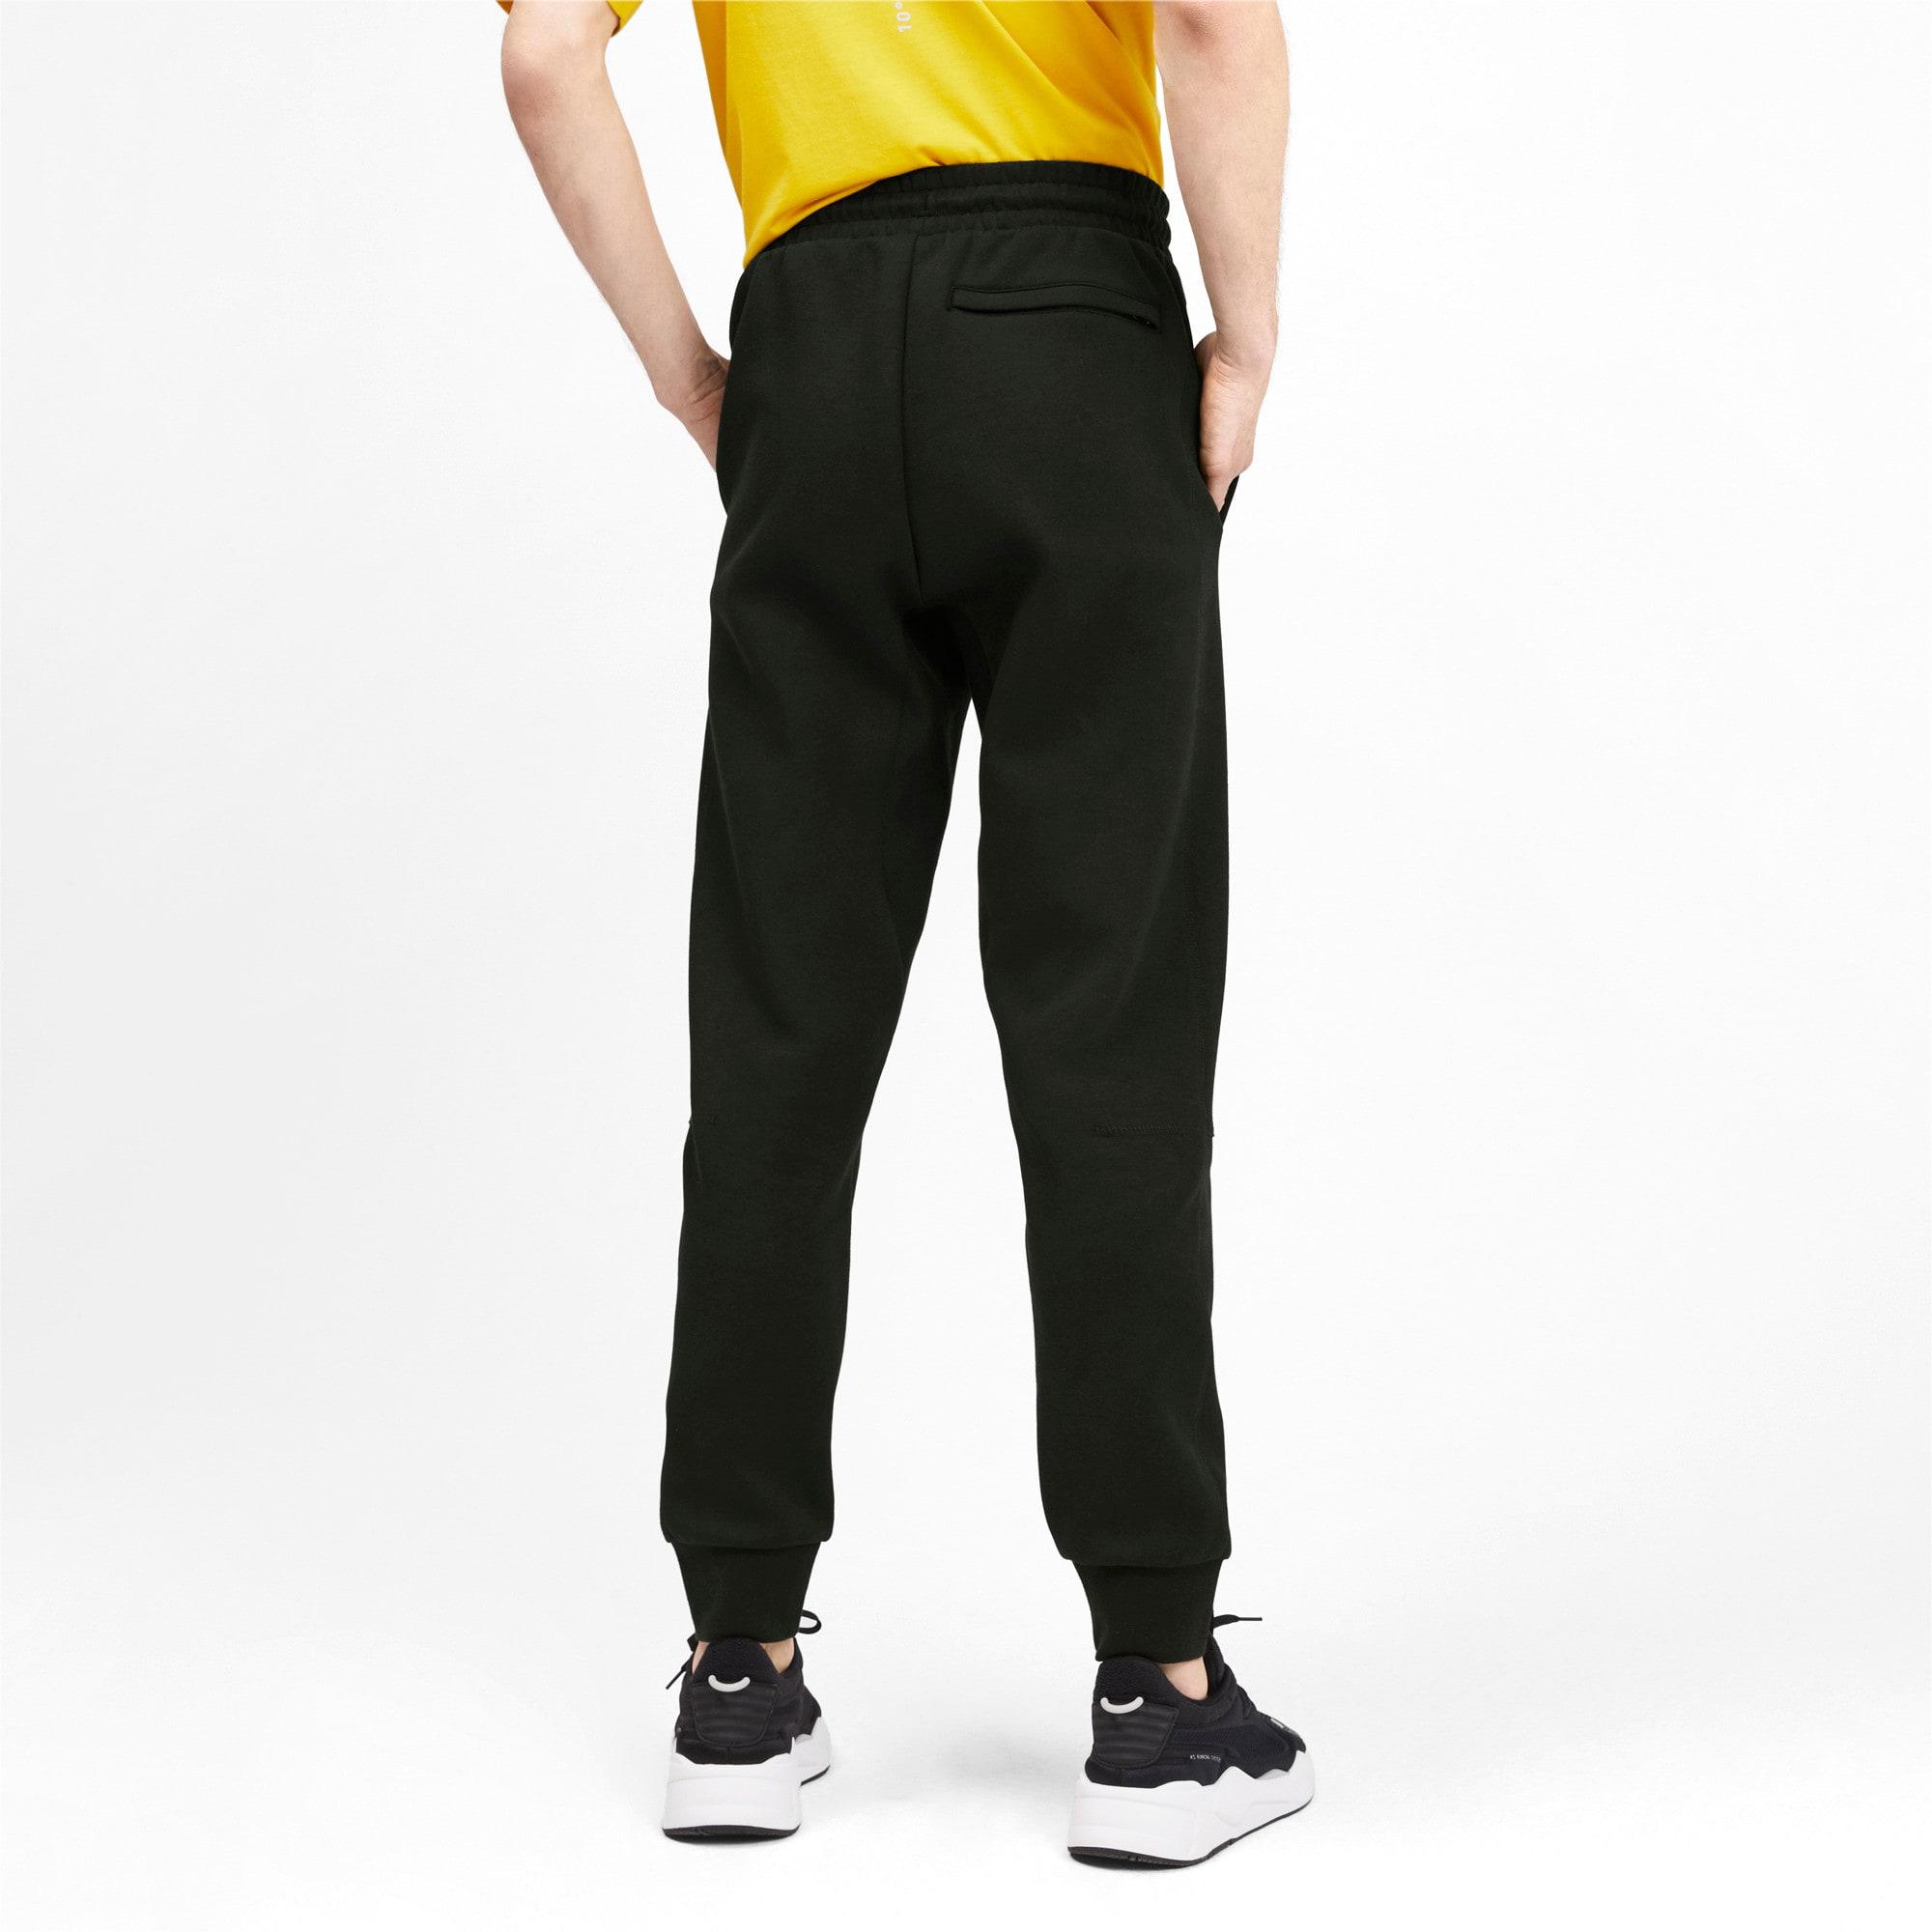 Thumbnail 3 of Epoch Knitted broek voor heren, Puma Black, medium